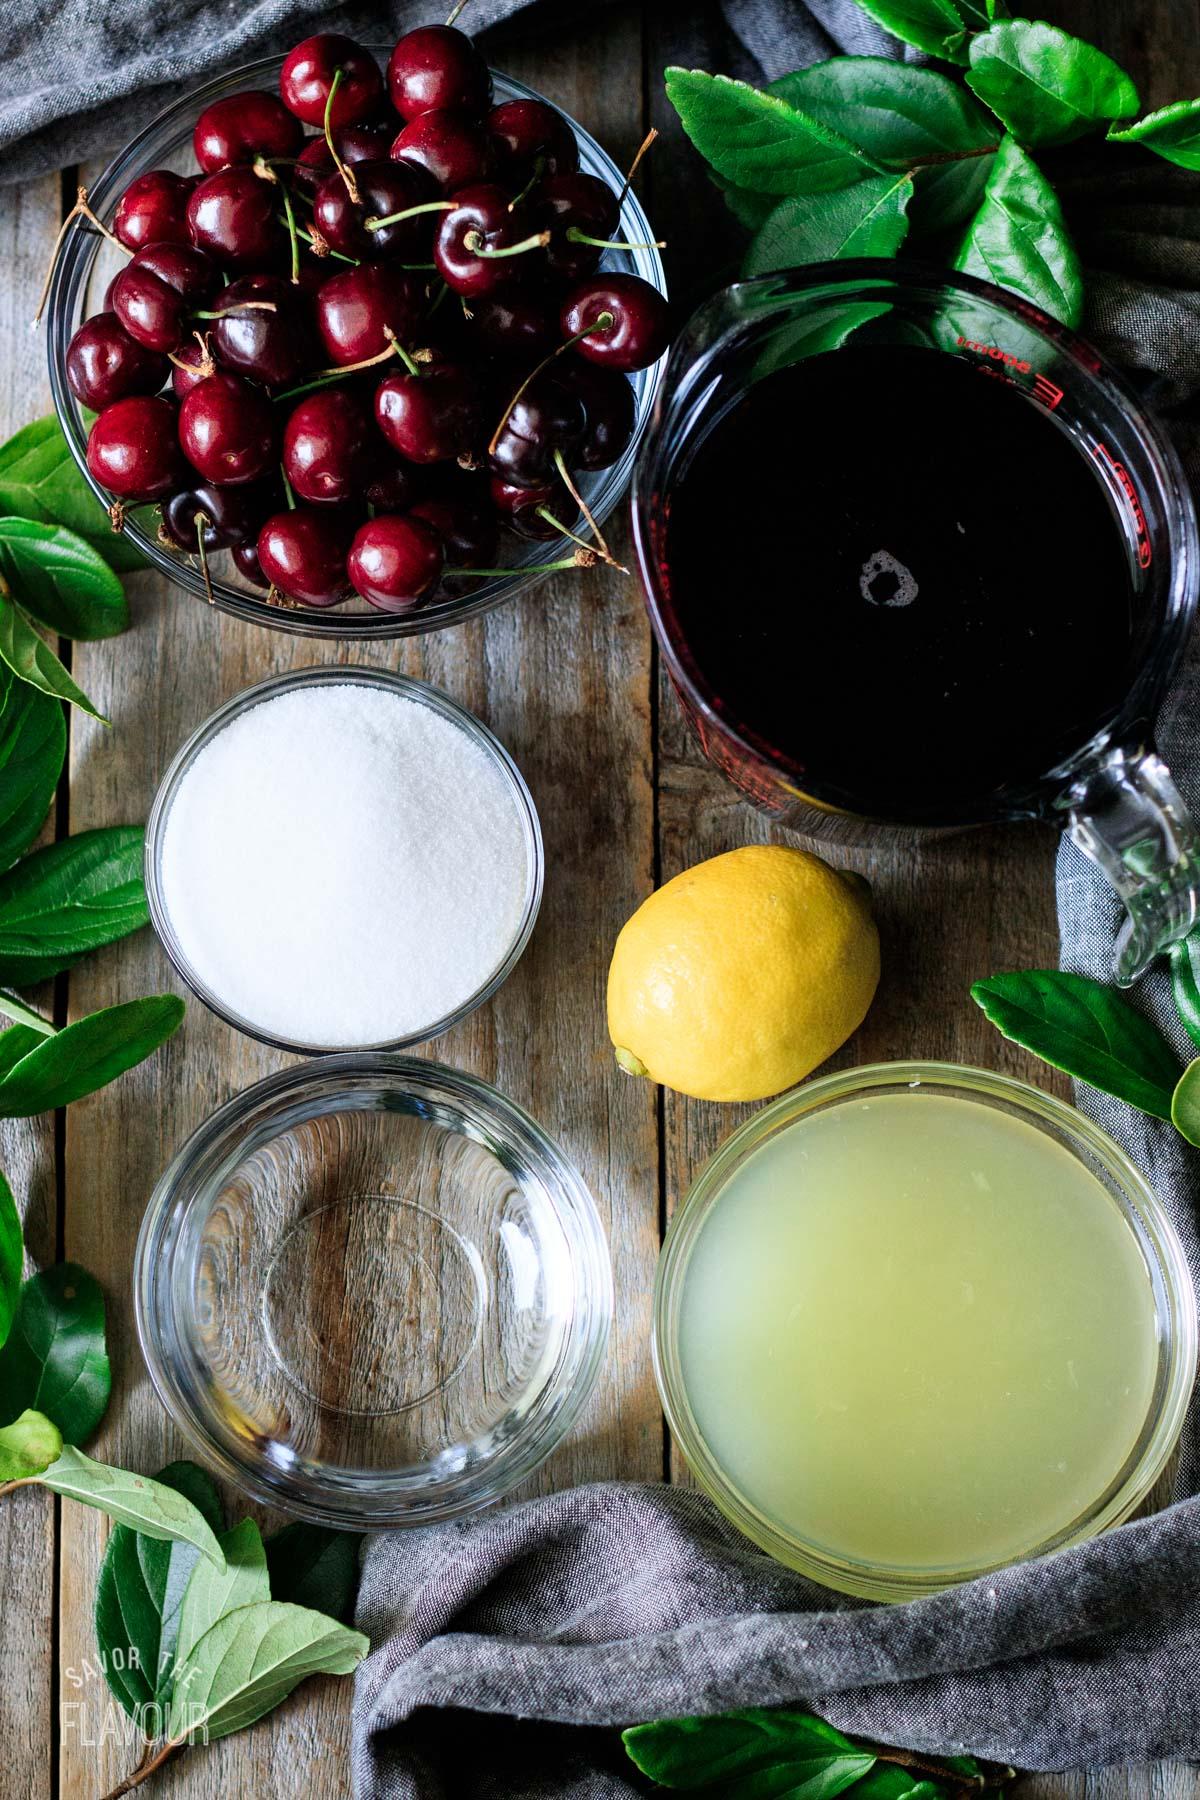 bowls of fresh cherries, juice, water, and sugar